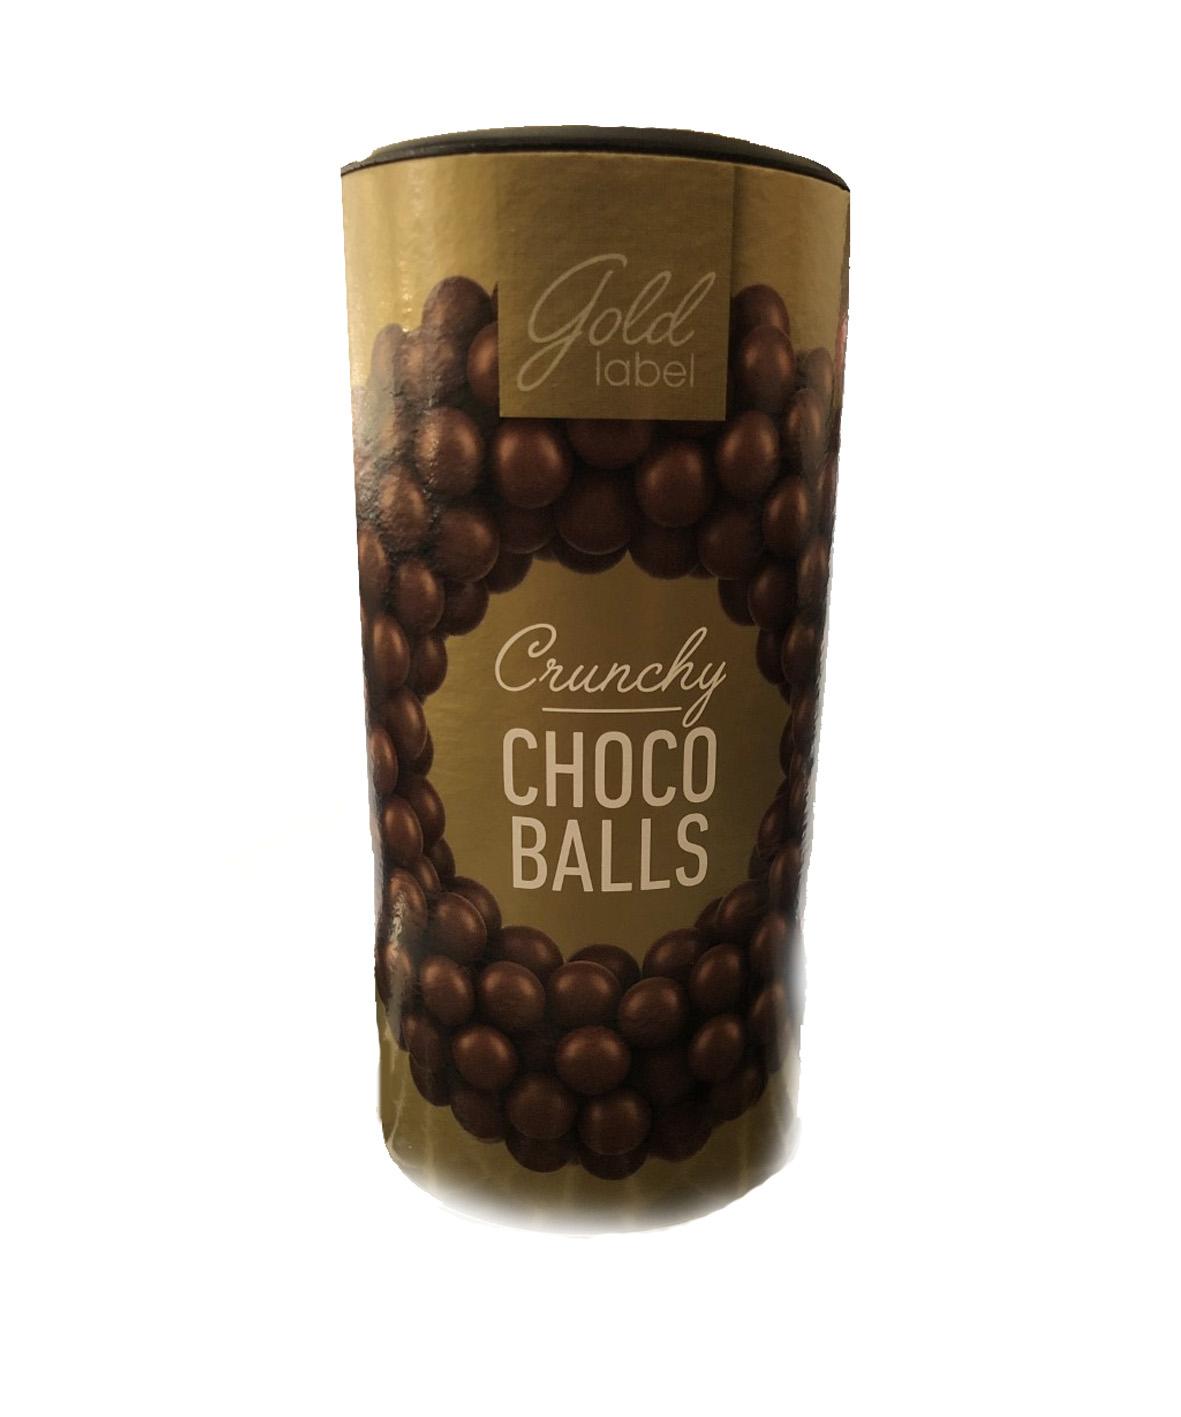 Gold Label crunchy choco balls 125g